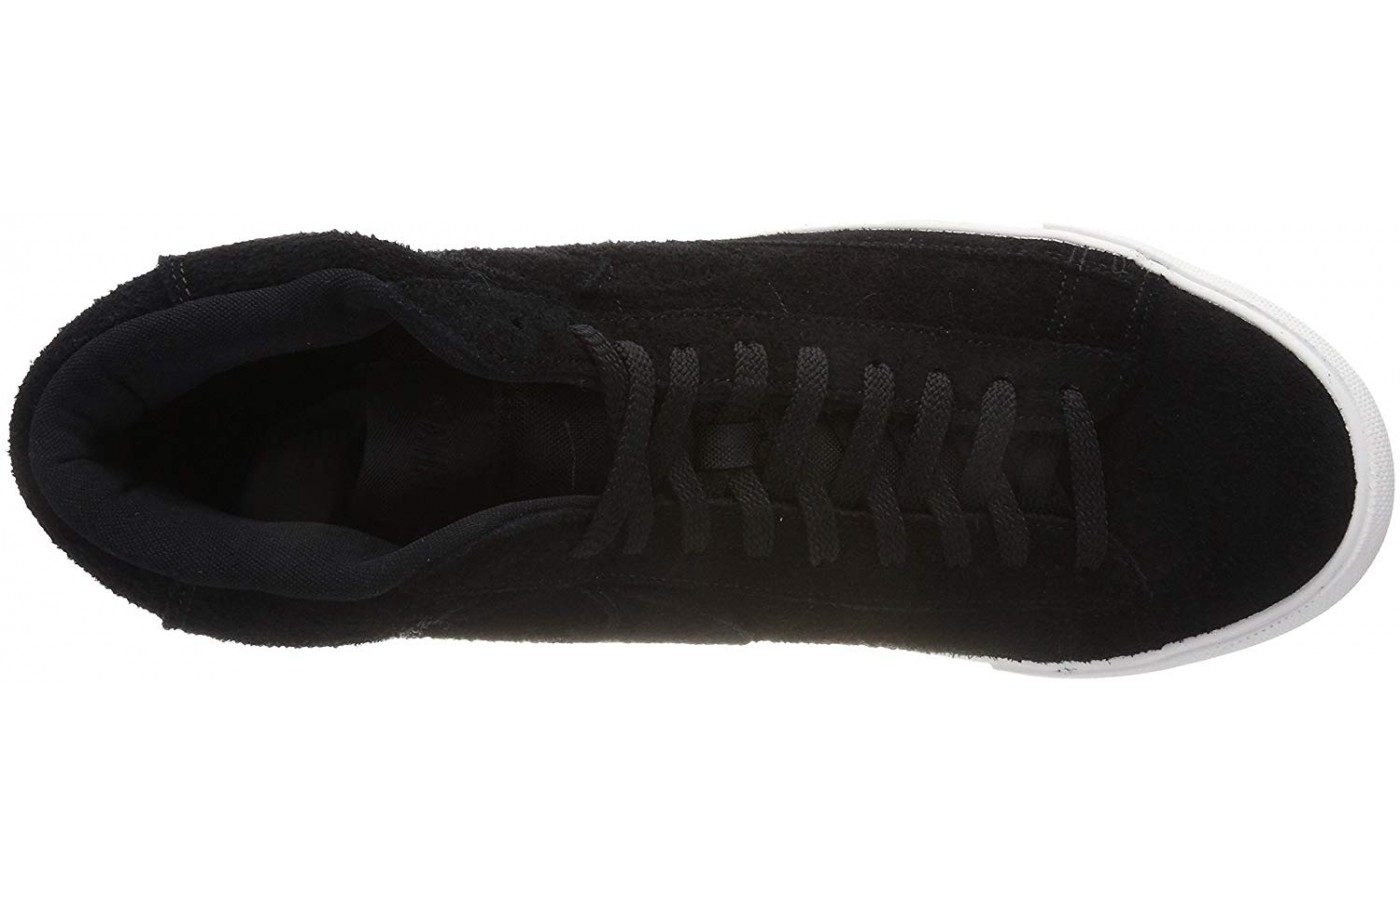 Nike Blazer Mid Upper